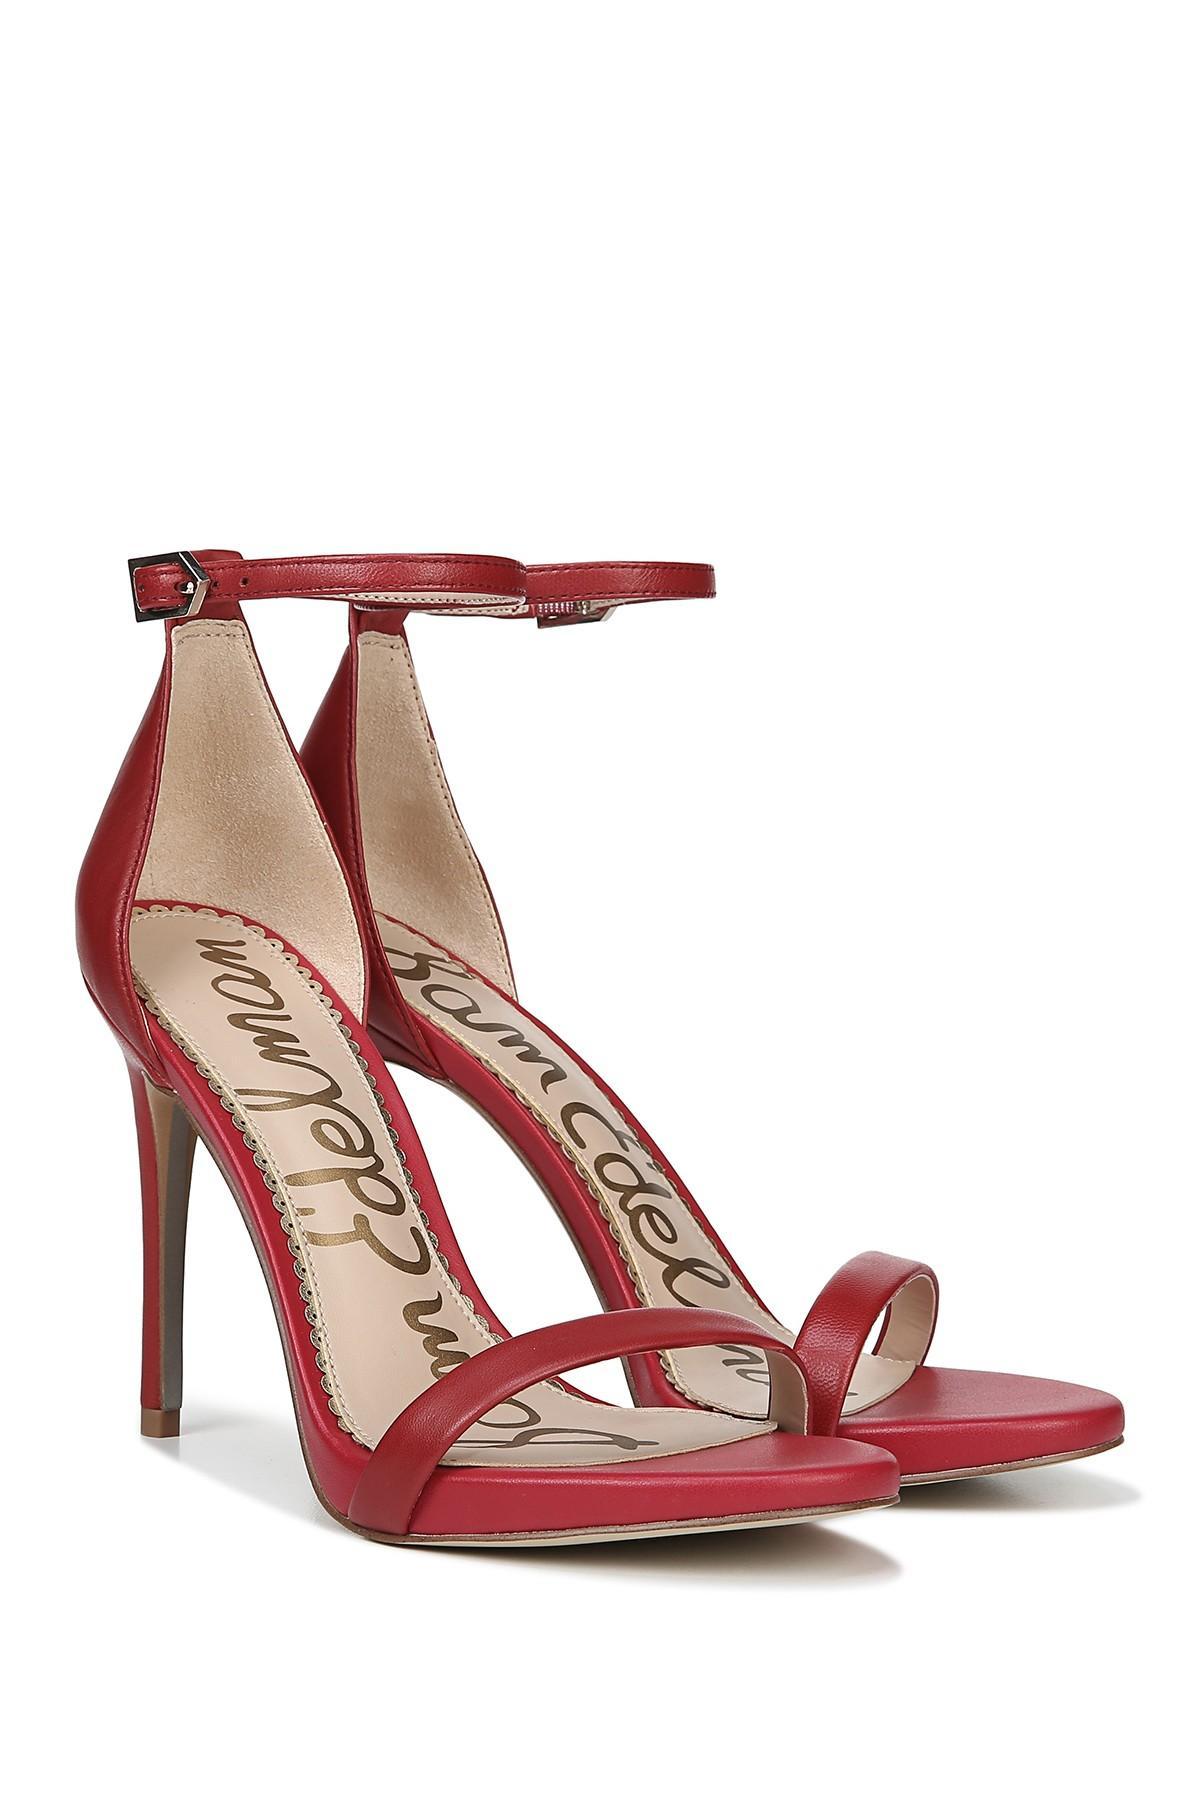 9c21cde23 Sam Edelman Ariella Ankle Strap Sandal in Red - Save 40% - Lyst